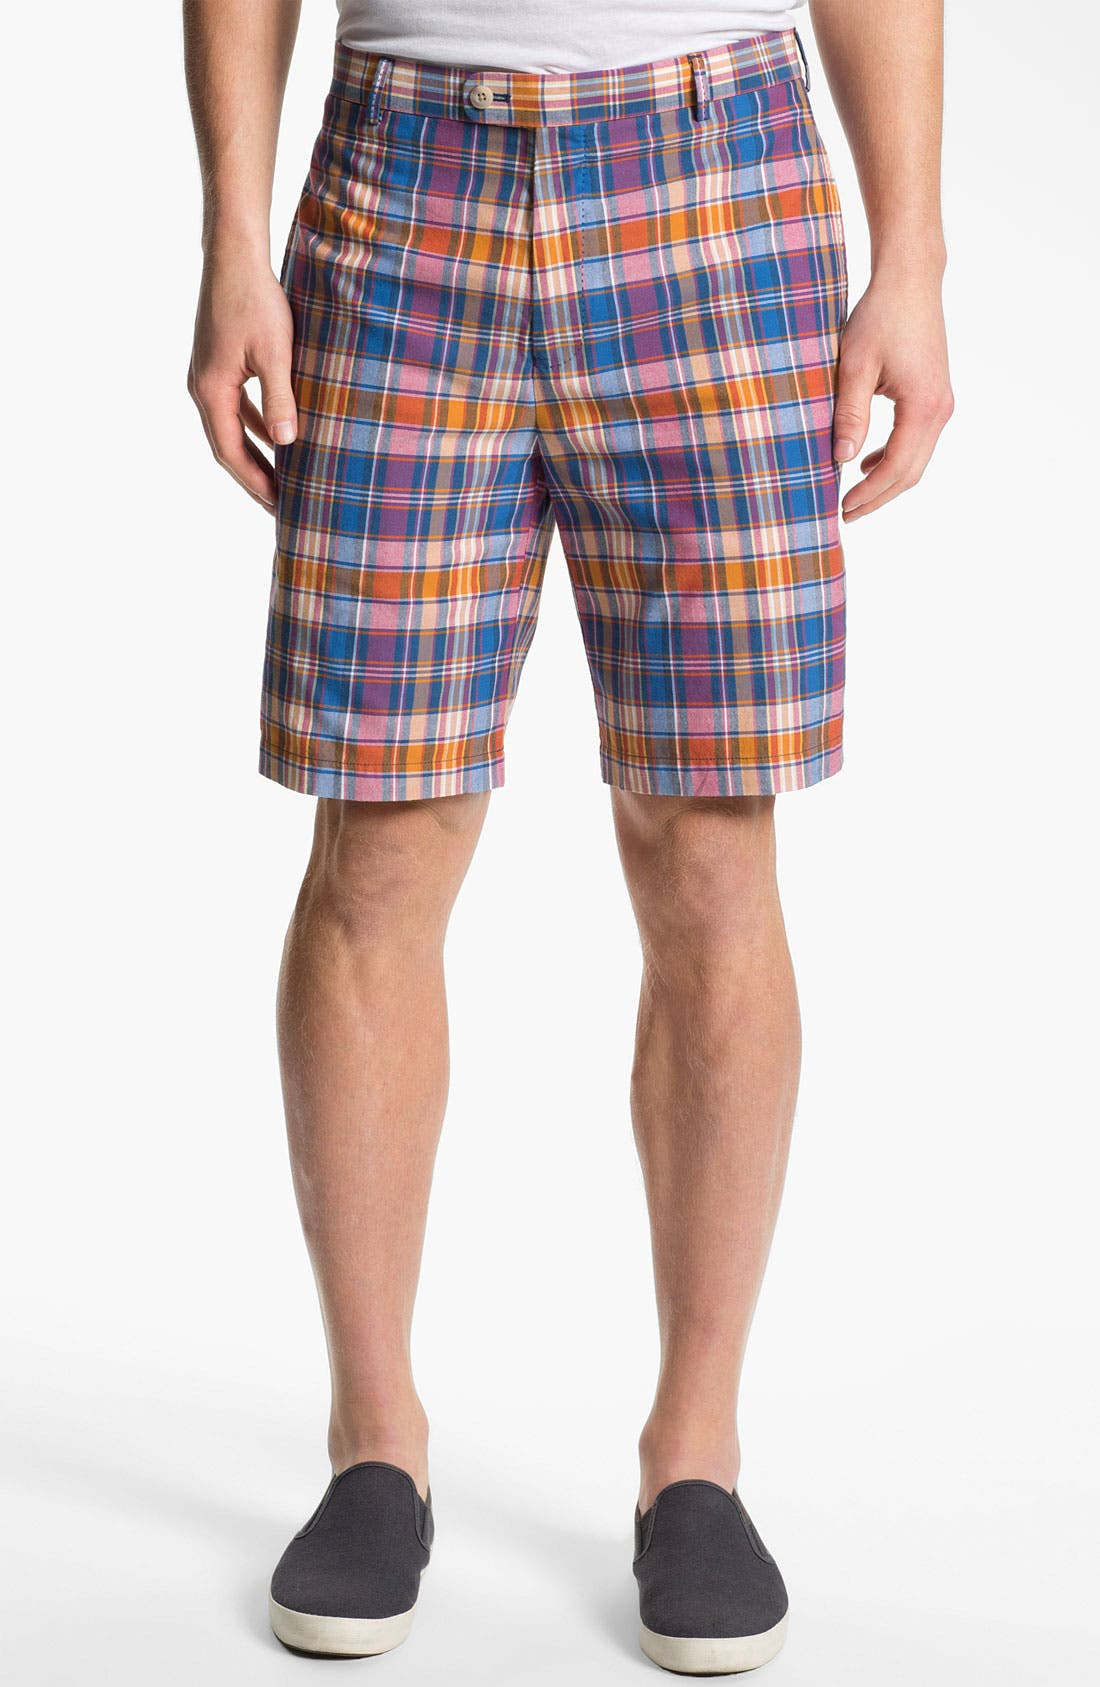 Alternate Image 1 Selected - Peter Millar 'Bolton' Flat Front Shorts